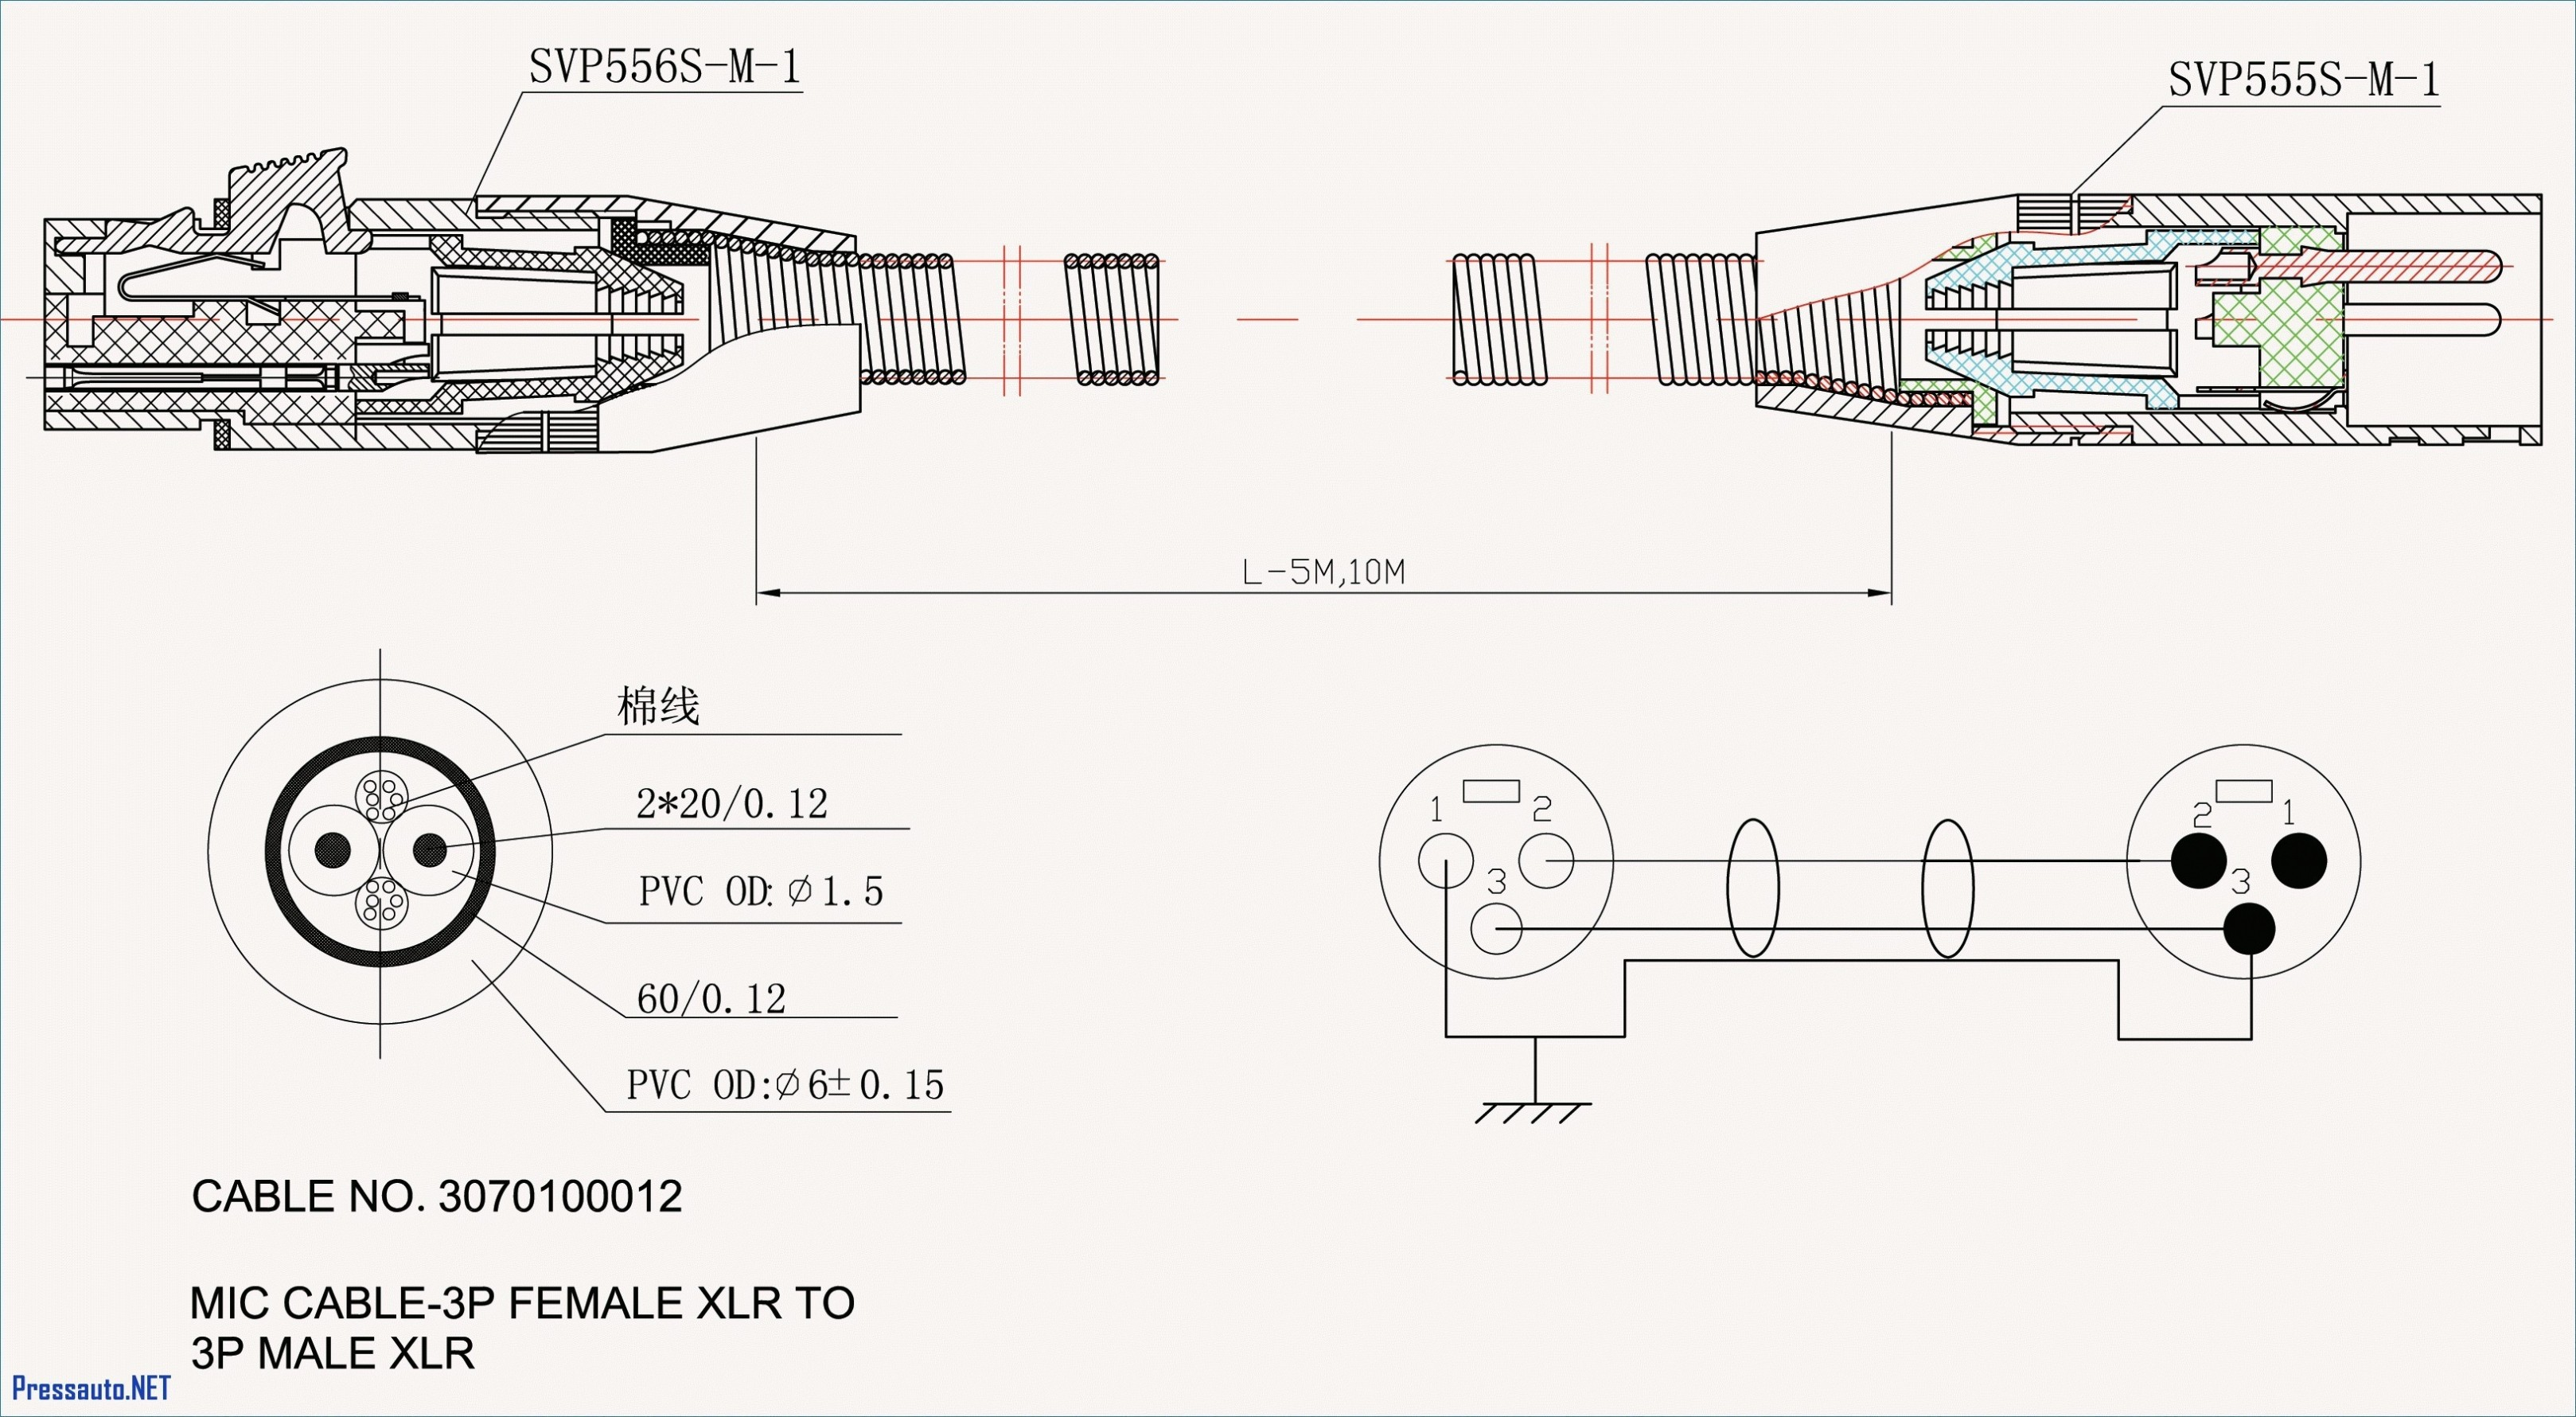 Car Spotlight Wiring Diagram Vehicle Wiring Diagrams V4 2 Wiring Diagram toolbox Of Car Spotlight Wiring Diagram